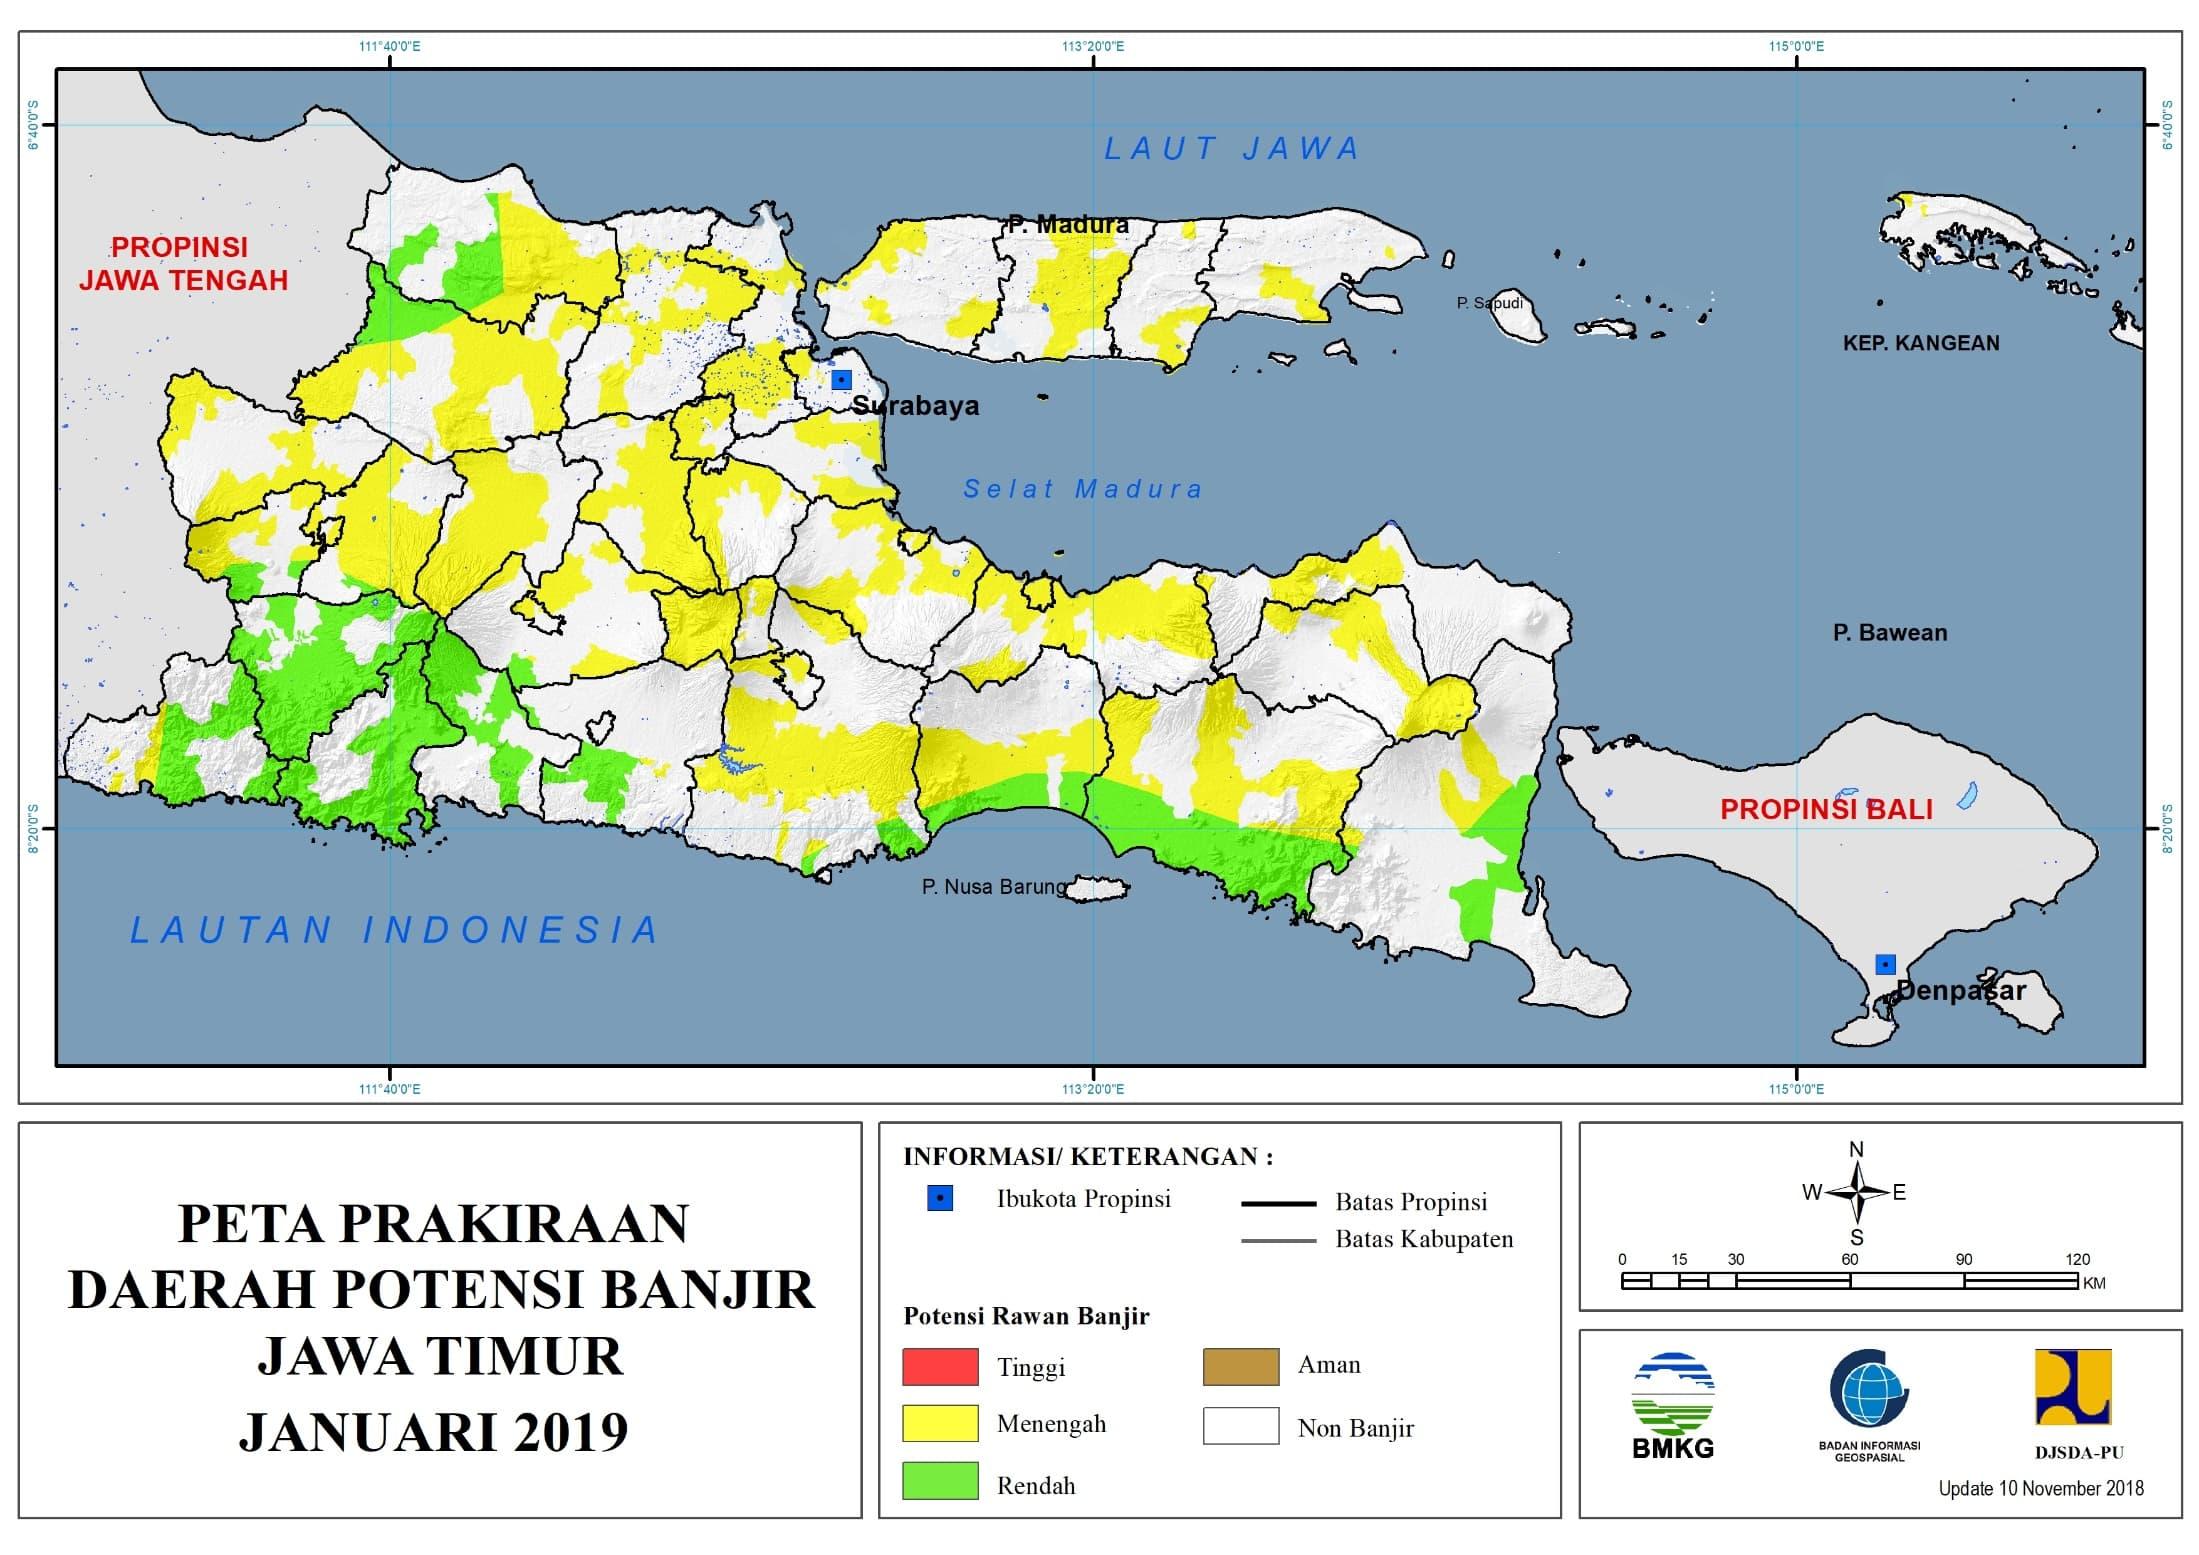 Prakiraan Bulanan Daerah Potensi Banjir di Provinsi Jawa Timur Bulan JANUARI 2019 update 10 Nopember 2018